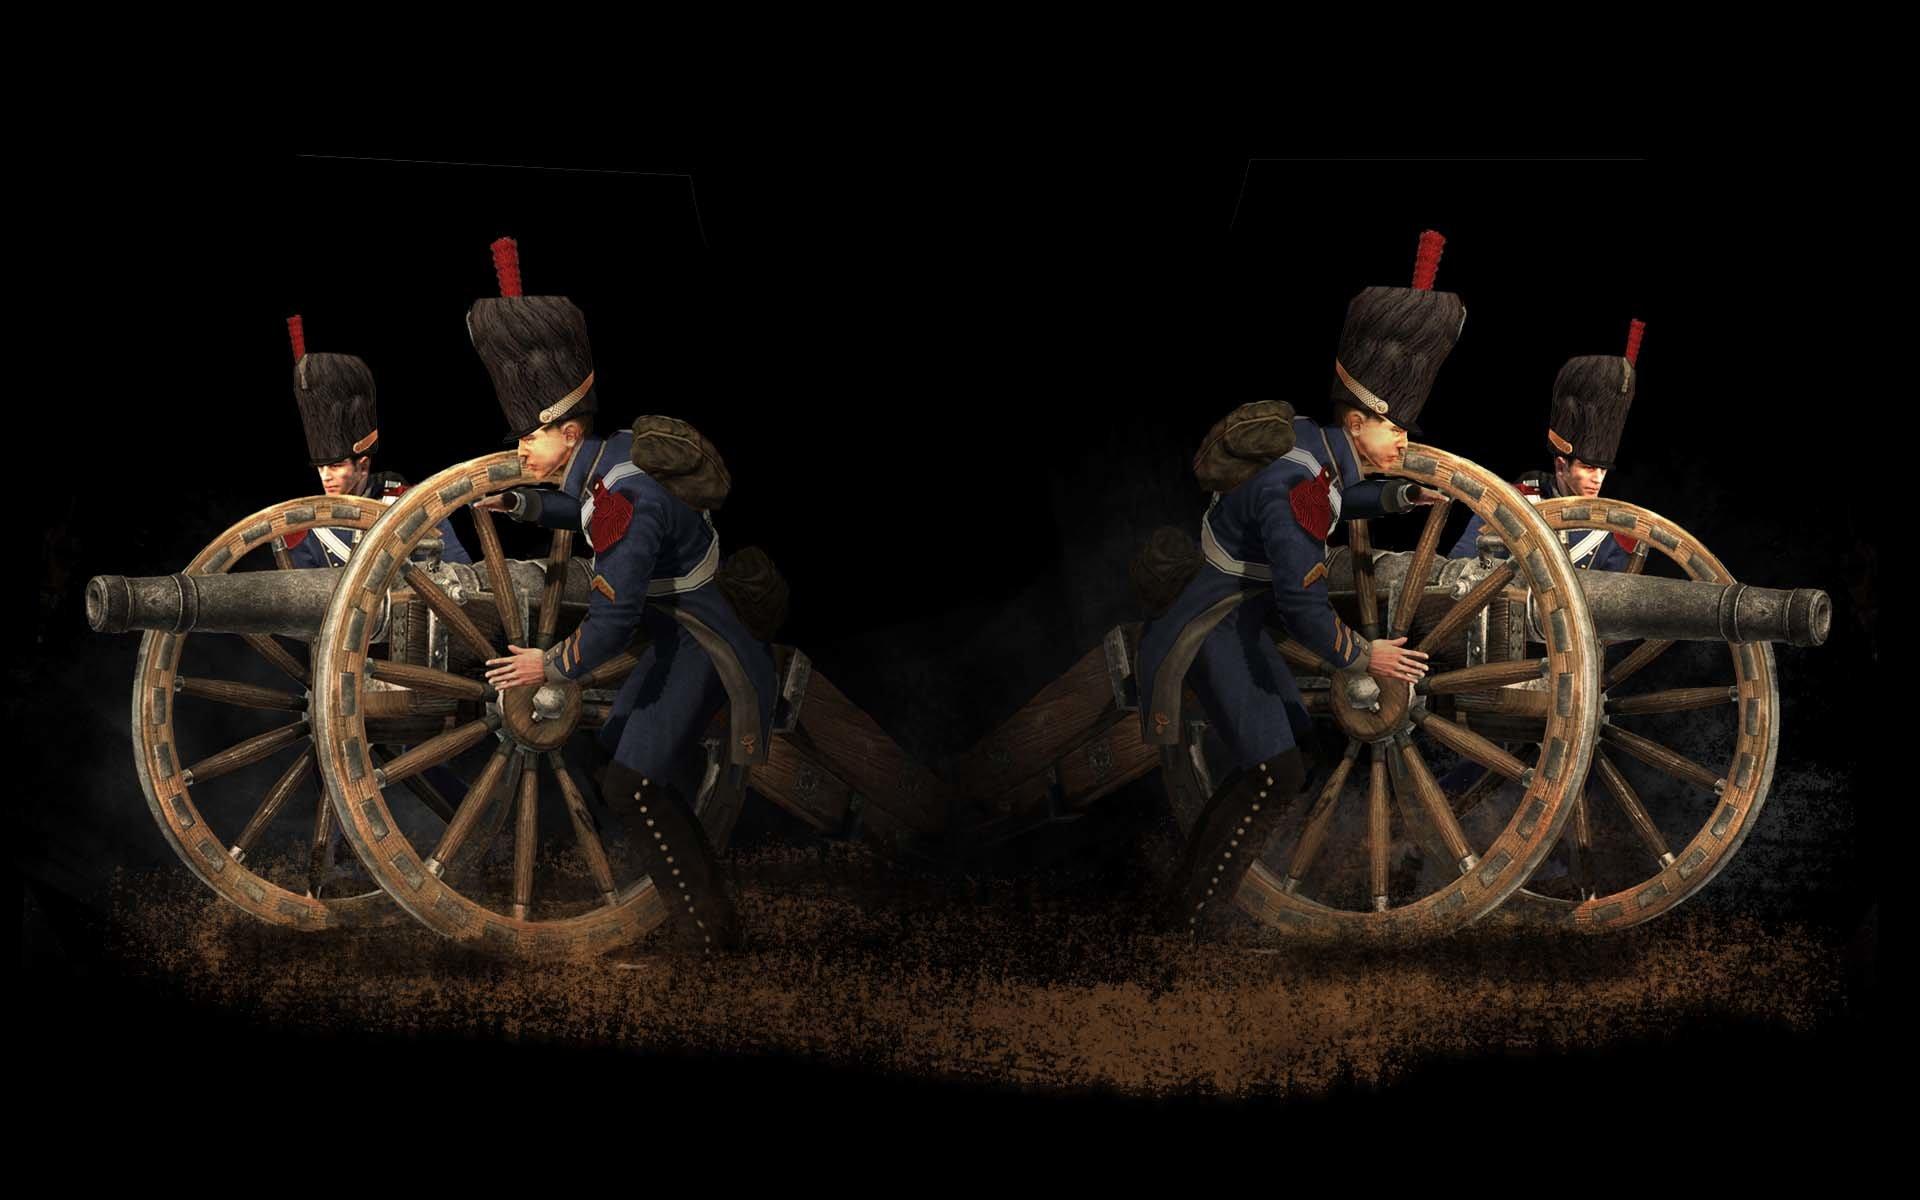 Napoleon Total War Wallpapers Hd For Desktop Backgrounds